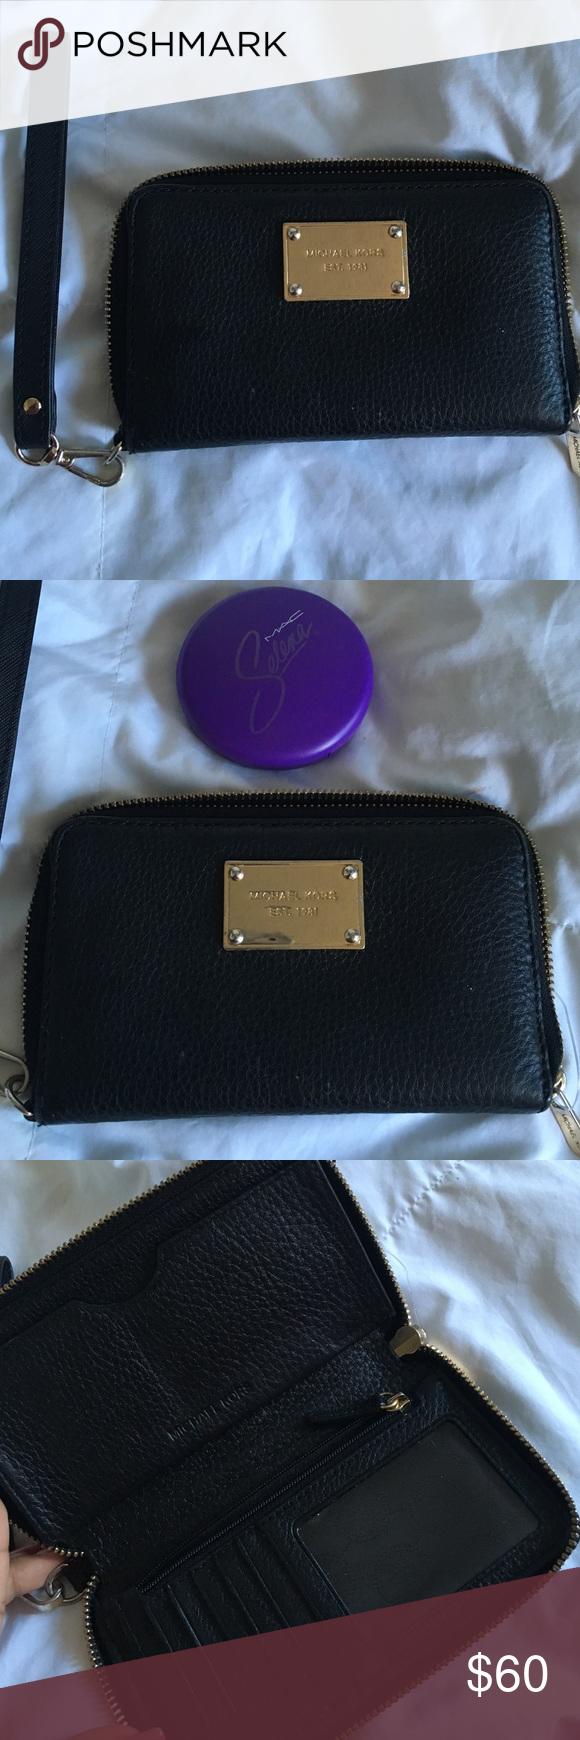 Michael Kors ⚜ wallet Michael kors black wallet , decent condition Michael Kors Bags Wallets